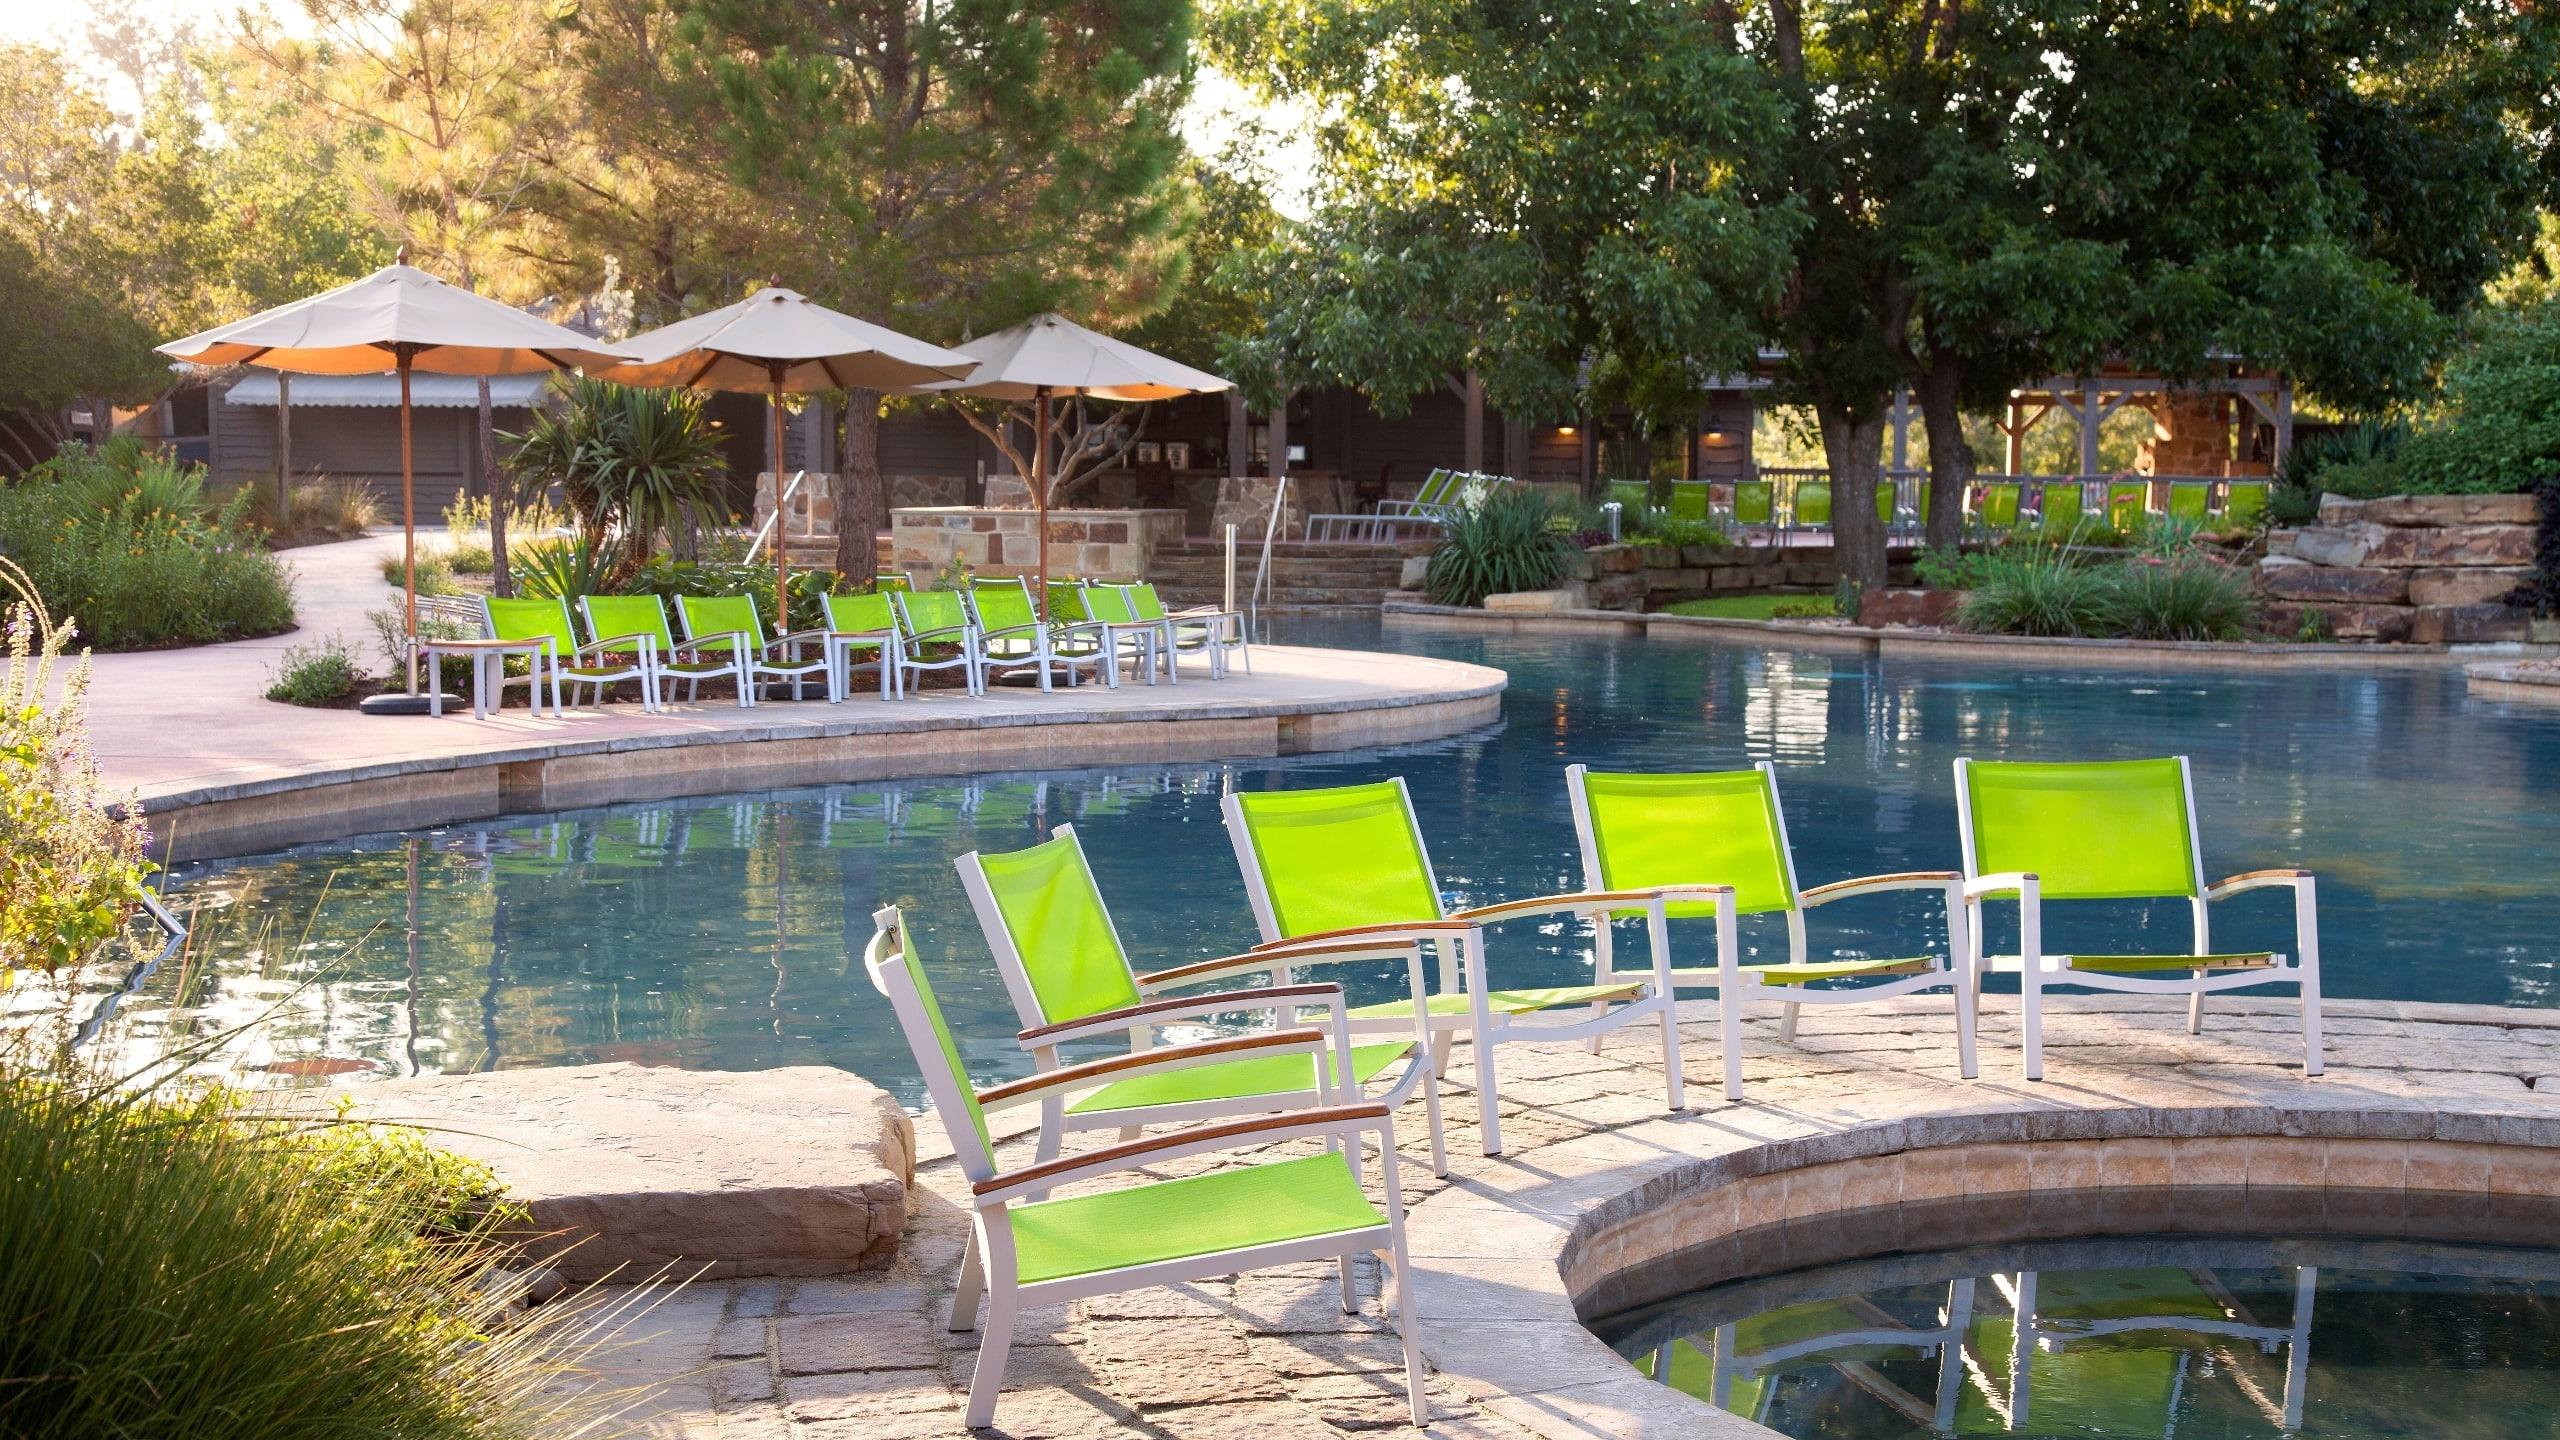 What's around Hyatt Regency Lost Pines Resort and Spa, Lost Pines, United States of America